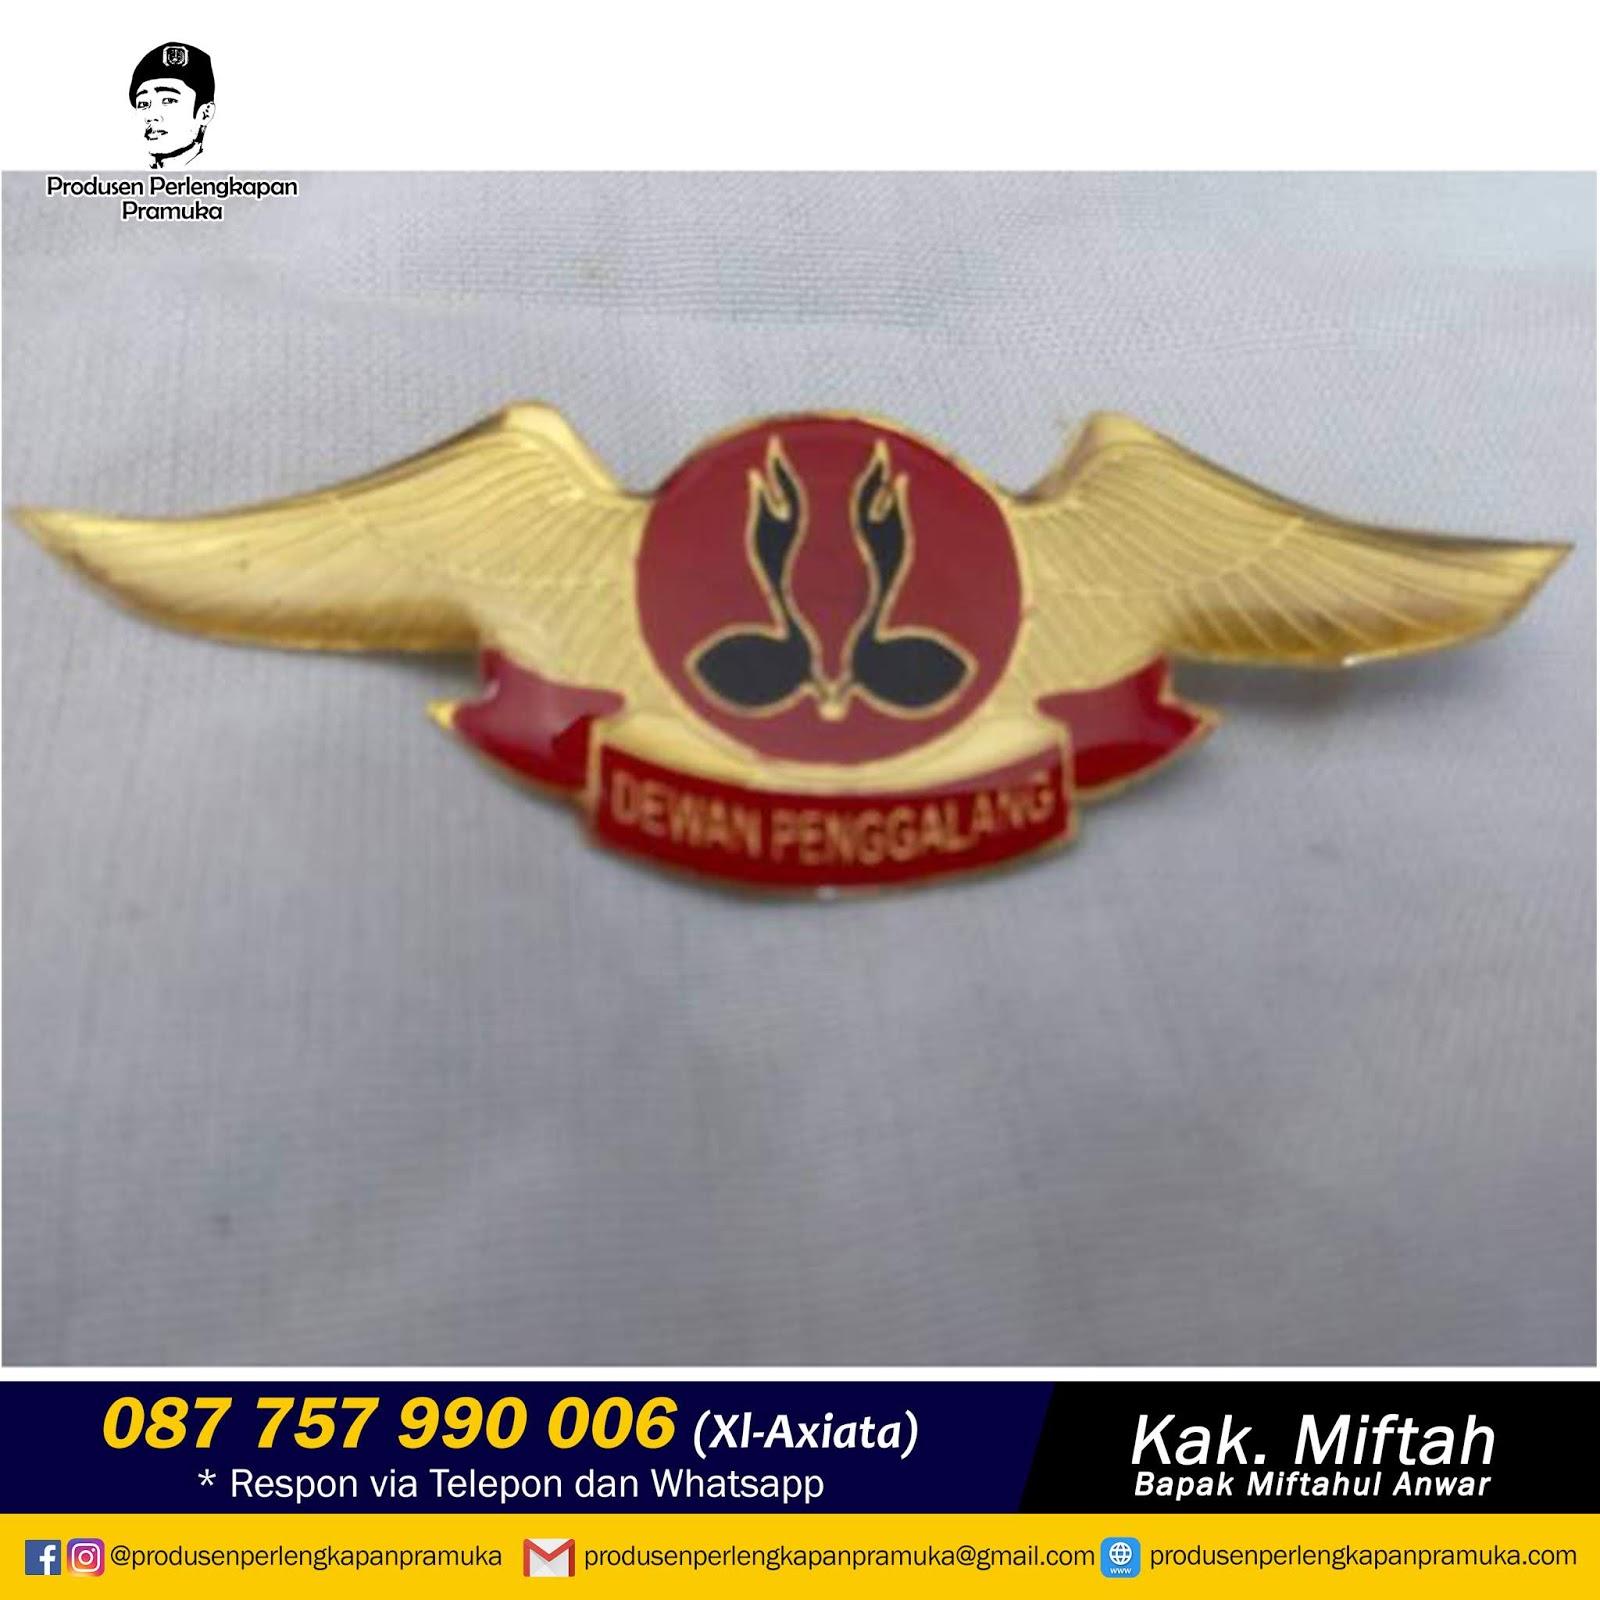 Grosir Wing Pramuka Penggalang | Jual Wing Pramuka Penggalang | Produksi Wing Pramuka Penggalang